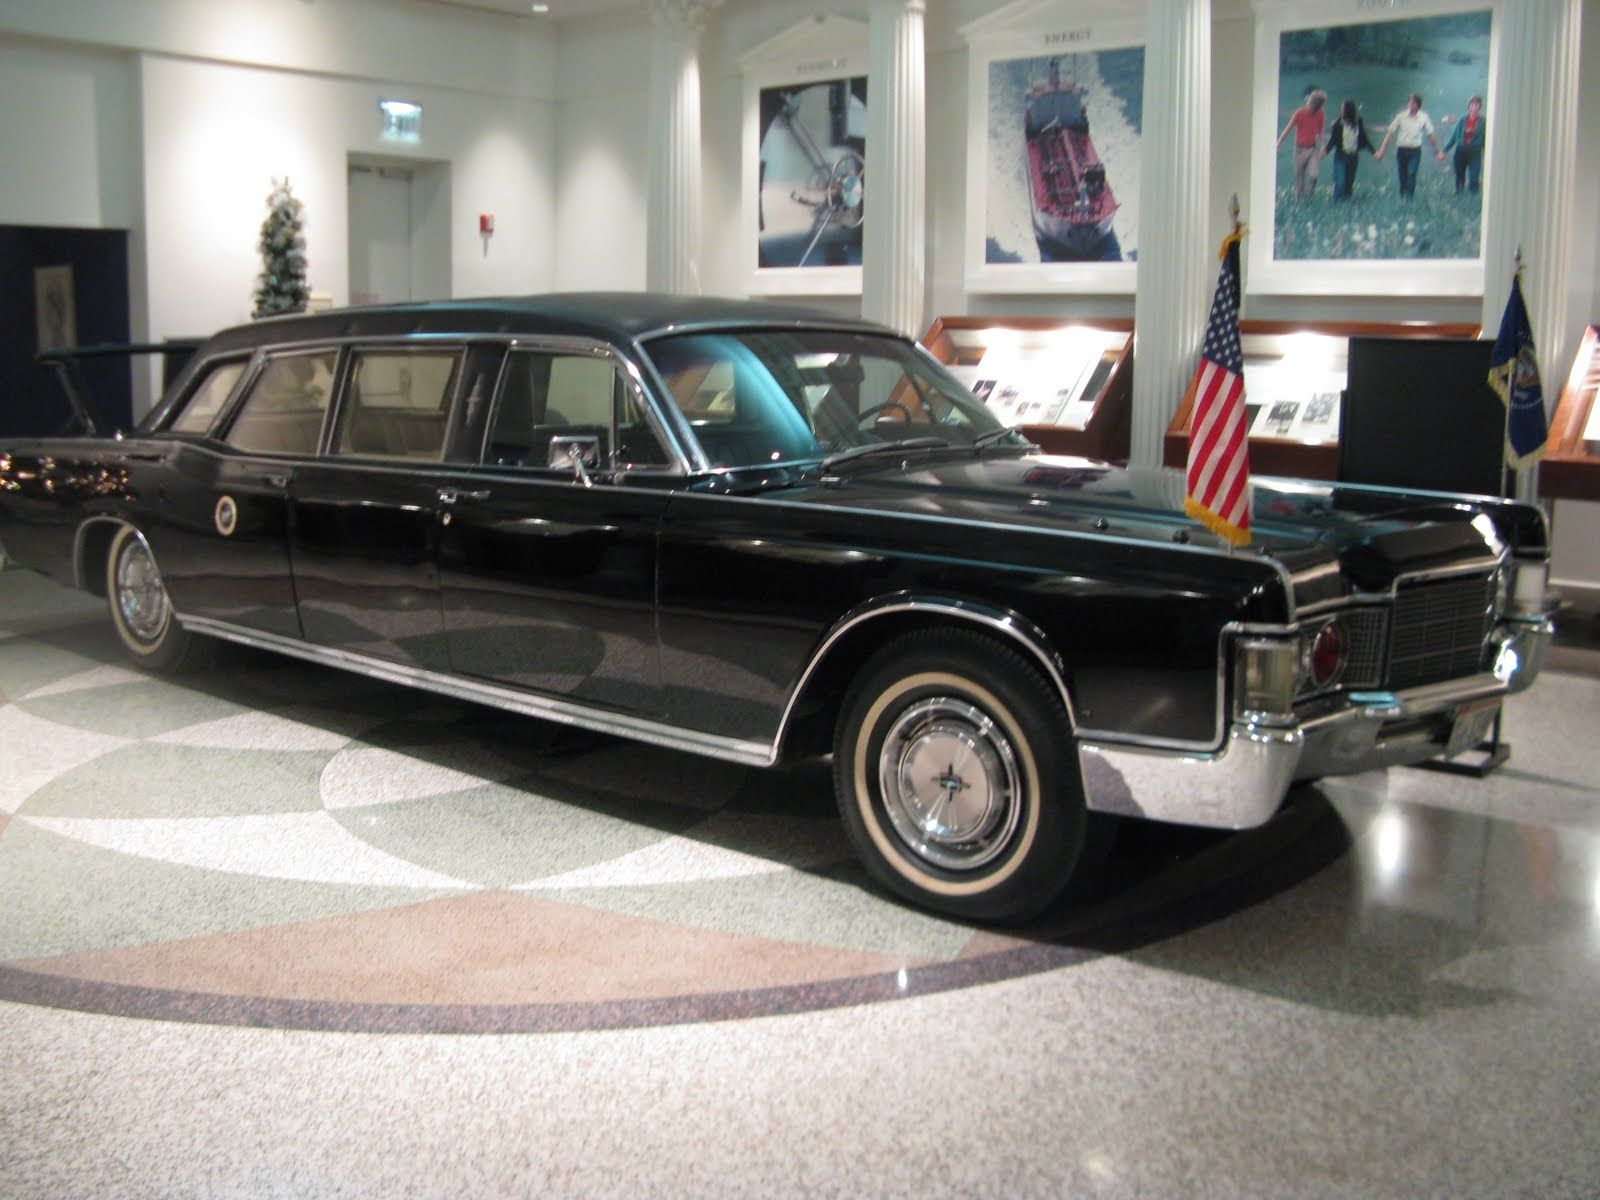 1960 lincoln continental mark v limousine elvis presley muscle car museum elvis presley vehicles pinterest car museum lincoln continental and